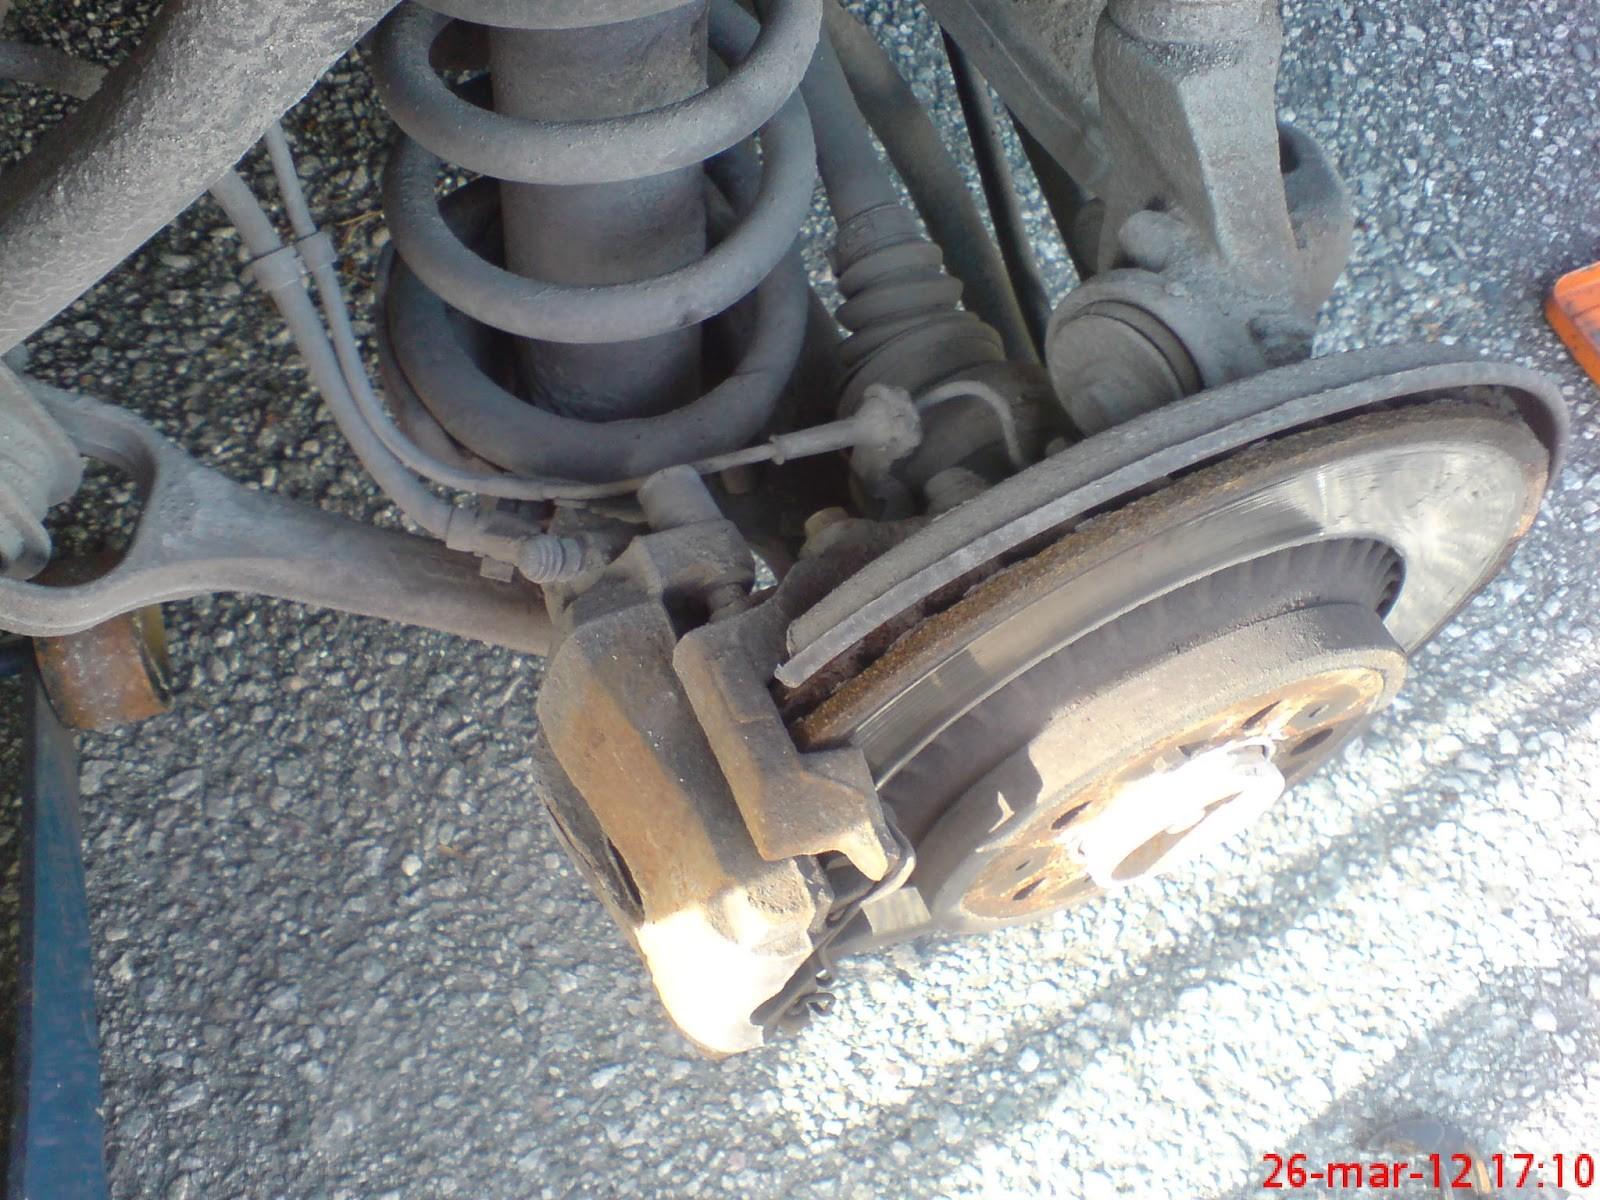 Rear Brake Shoes Diagram My Volvo Xc90 Of Rear Brake Shoes Diagram